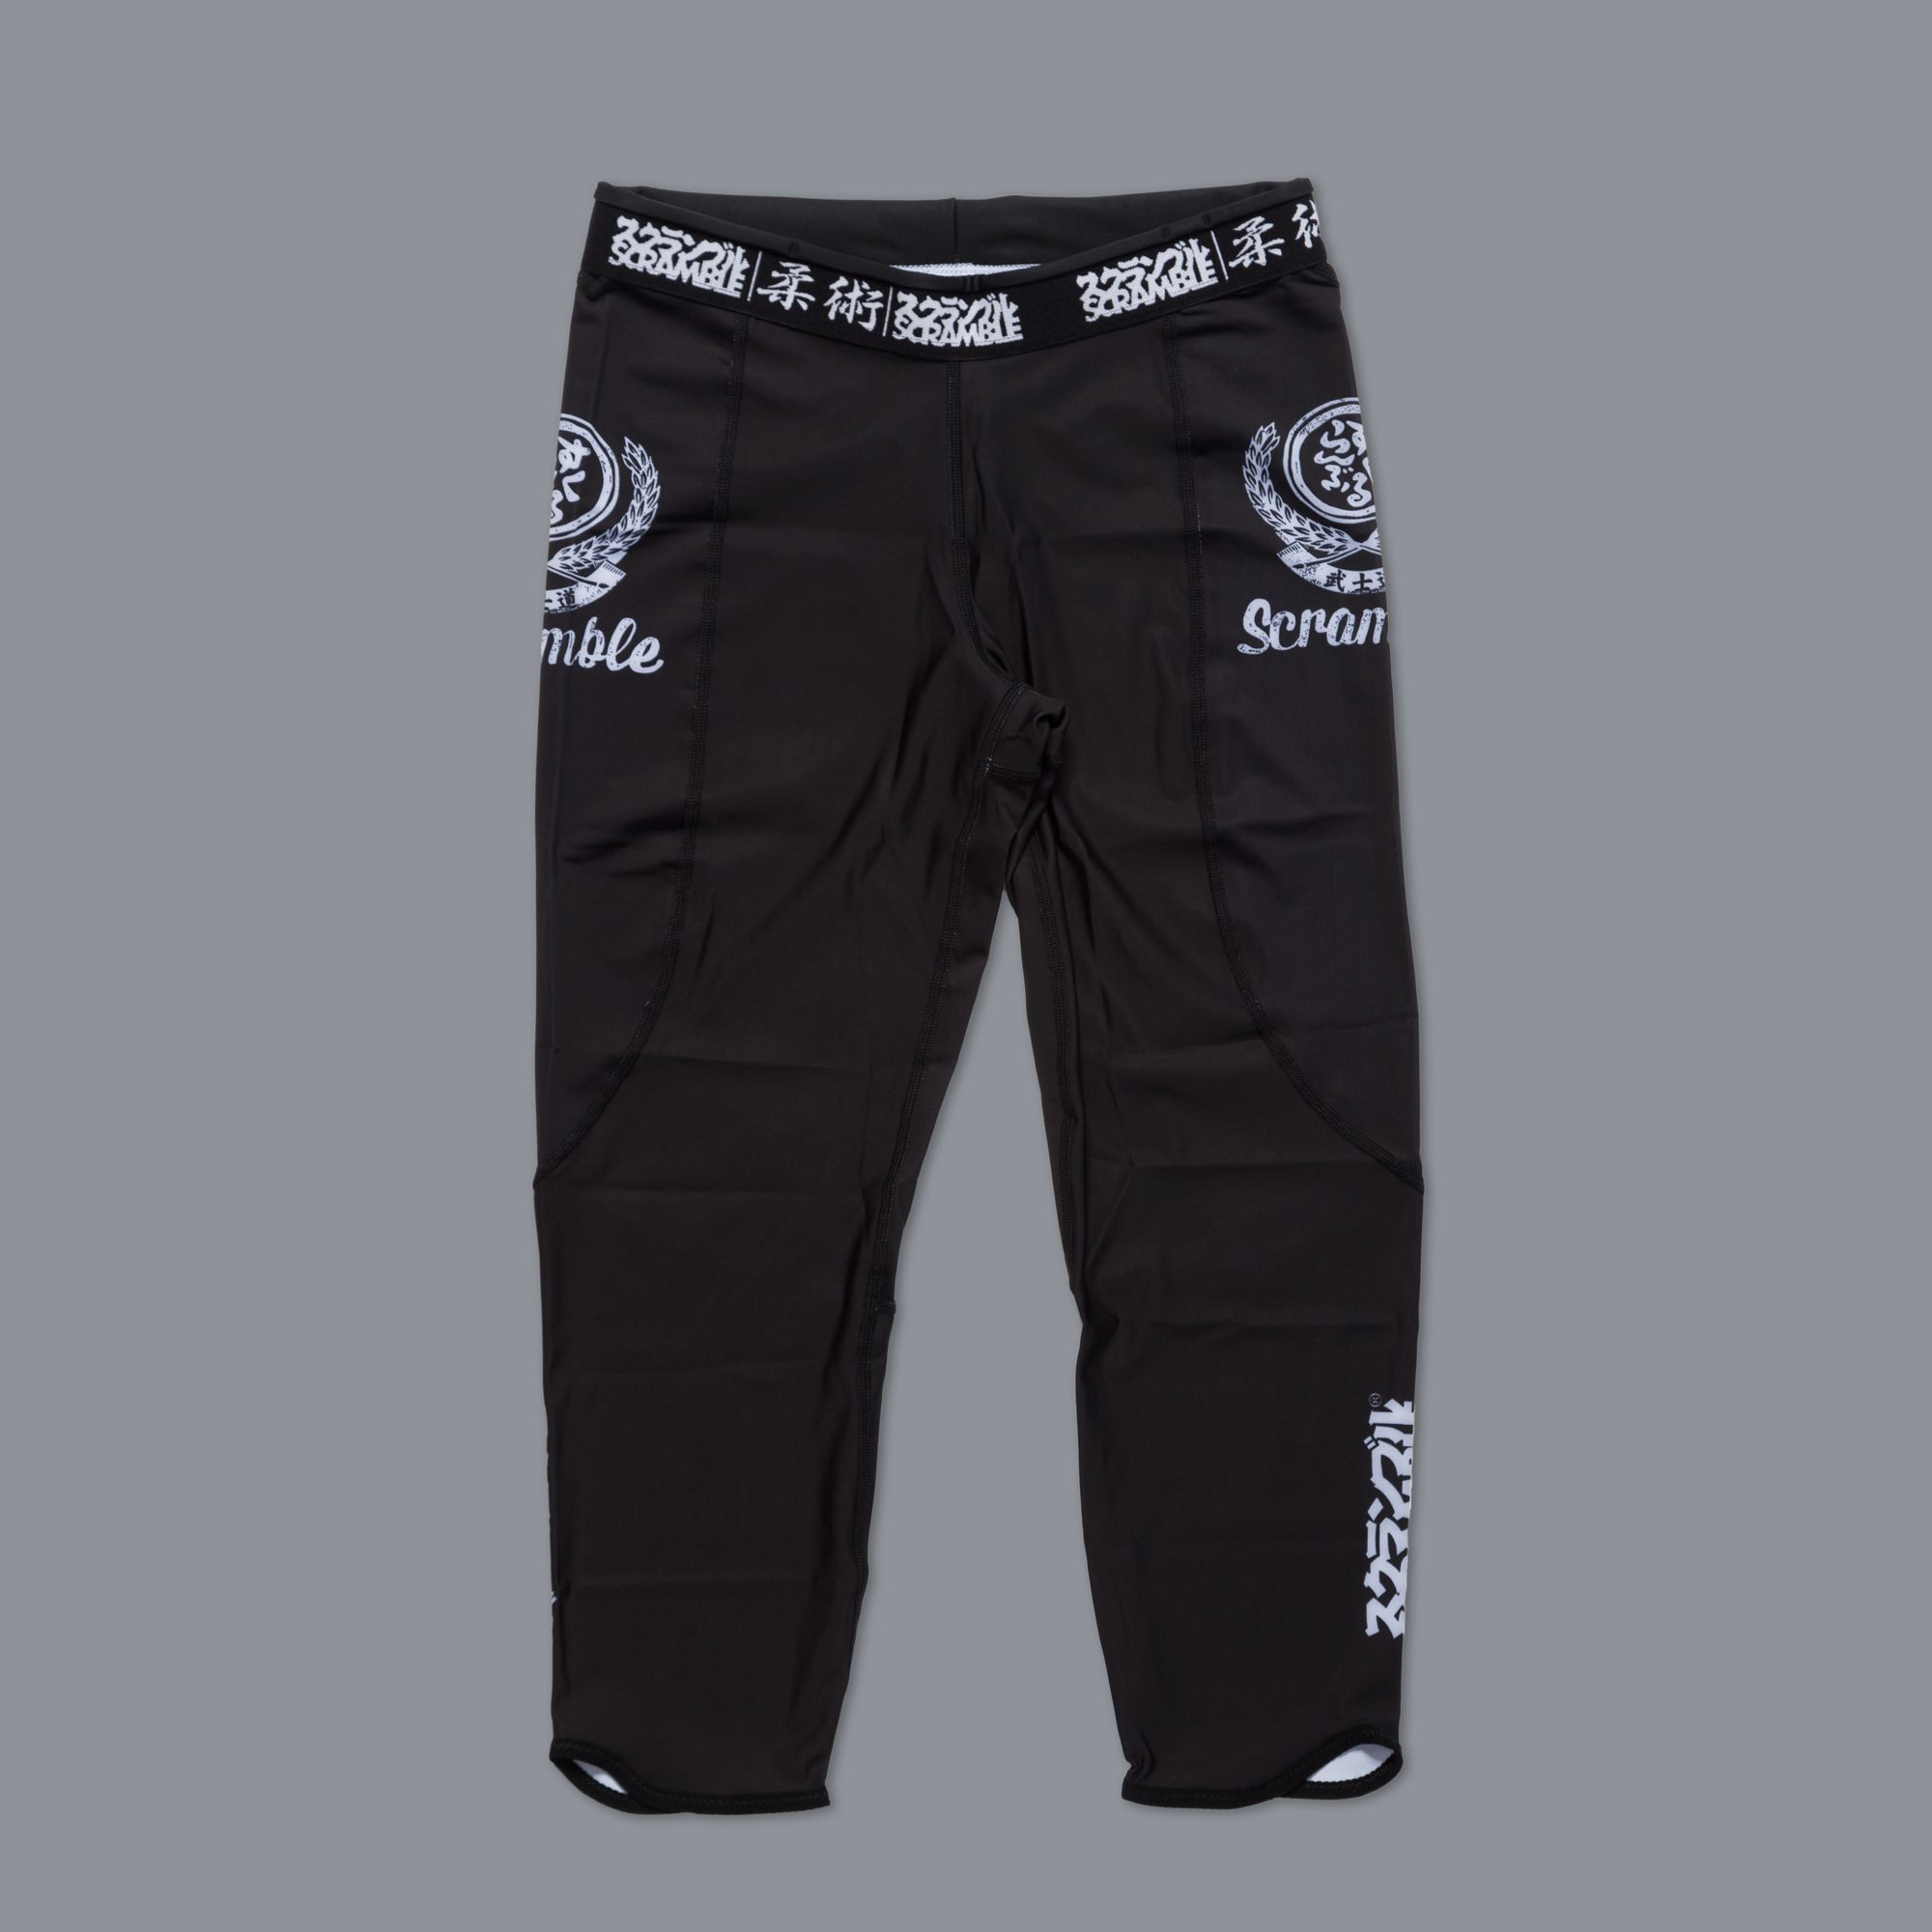 scramble-ladies-black-spats